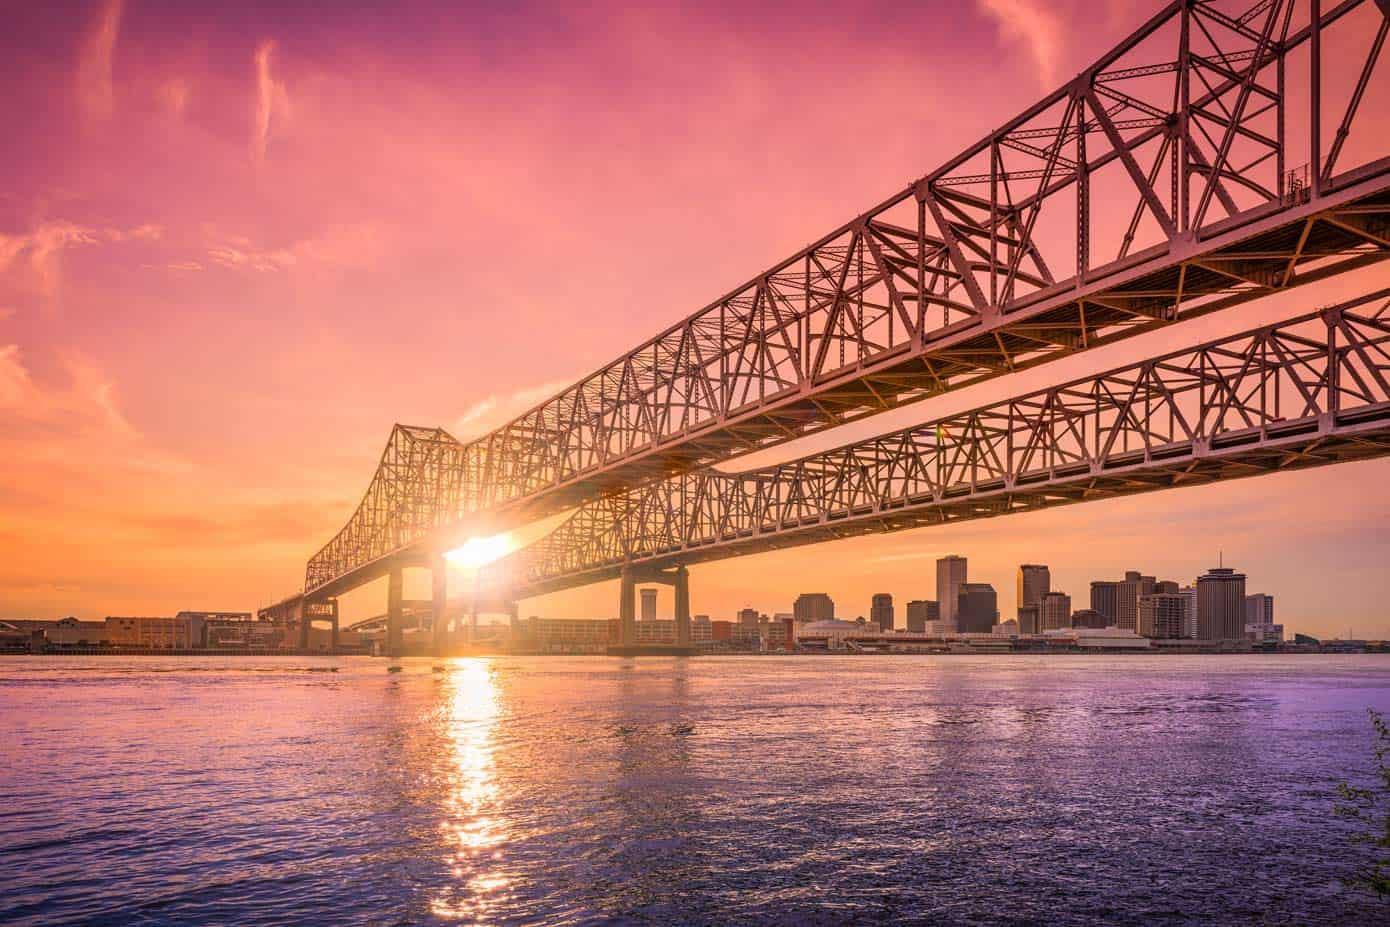 The Crescent City Connection bridge in New Orleans, LA.